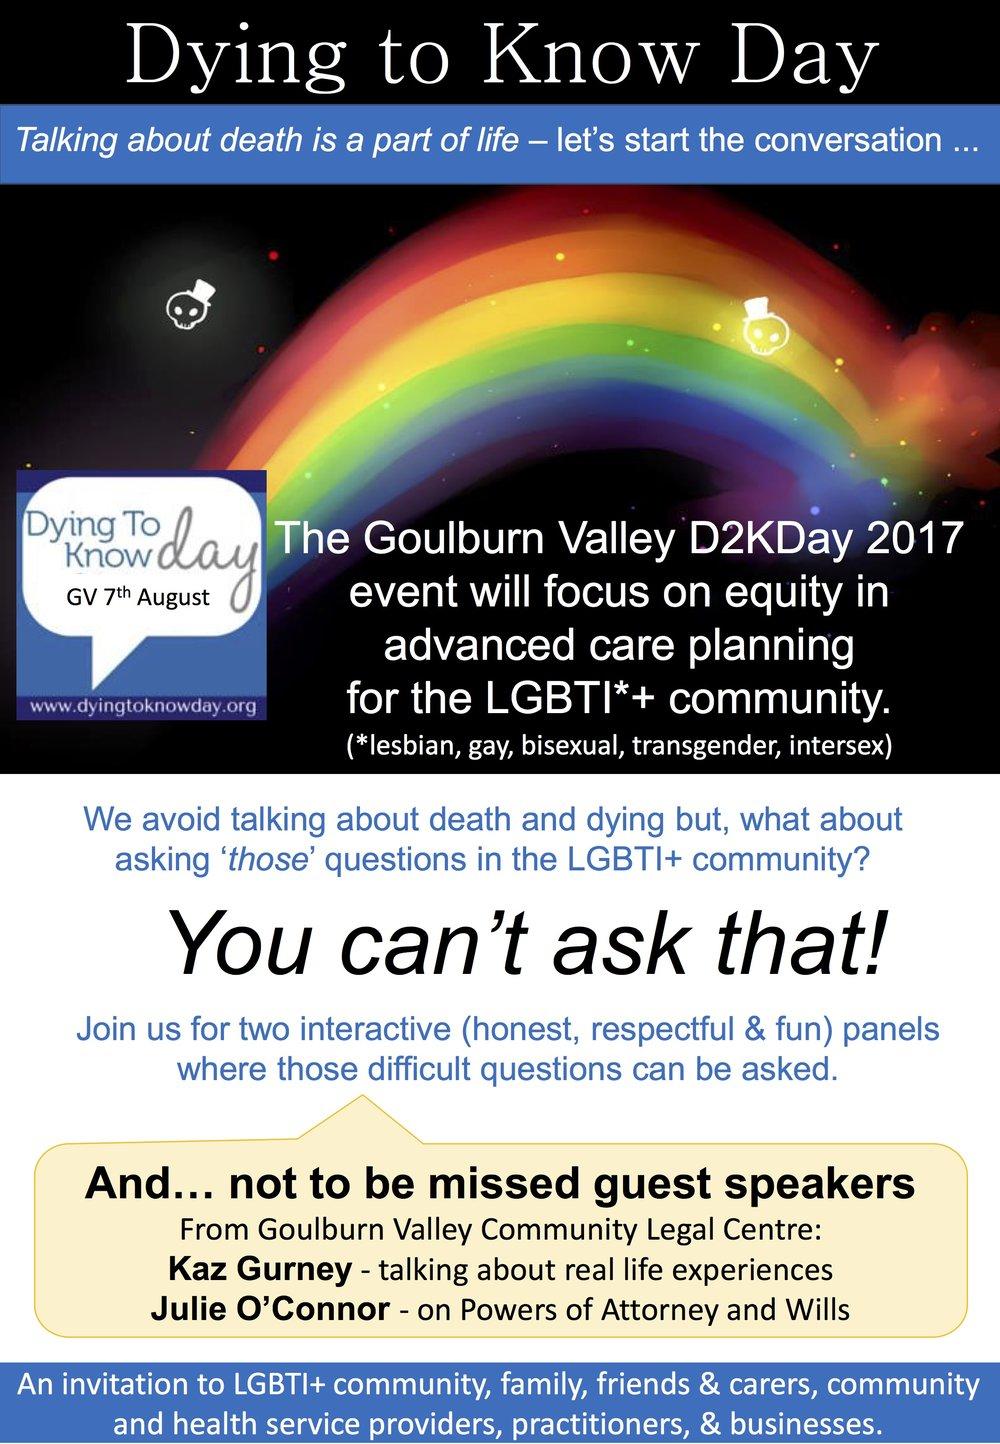 LGBTI Health Equity D2KDay Event Flyer 20172.jpg